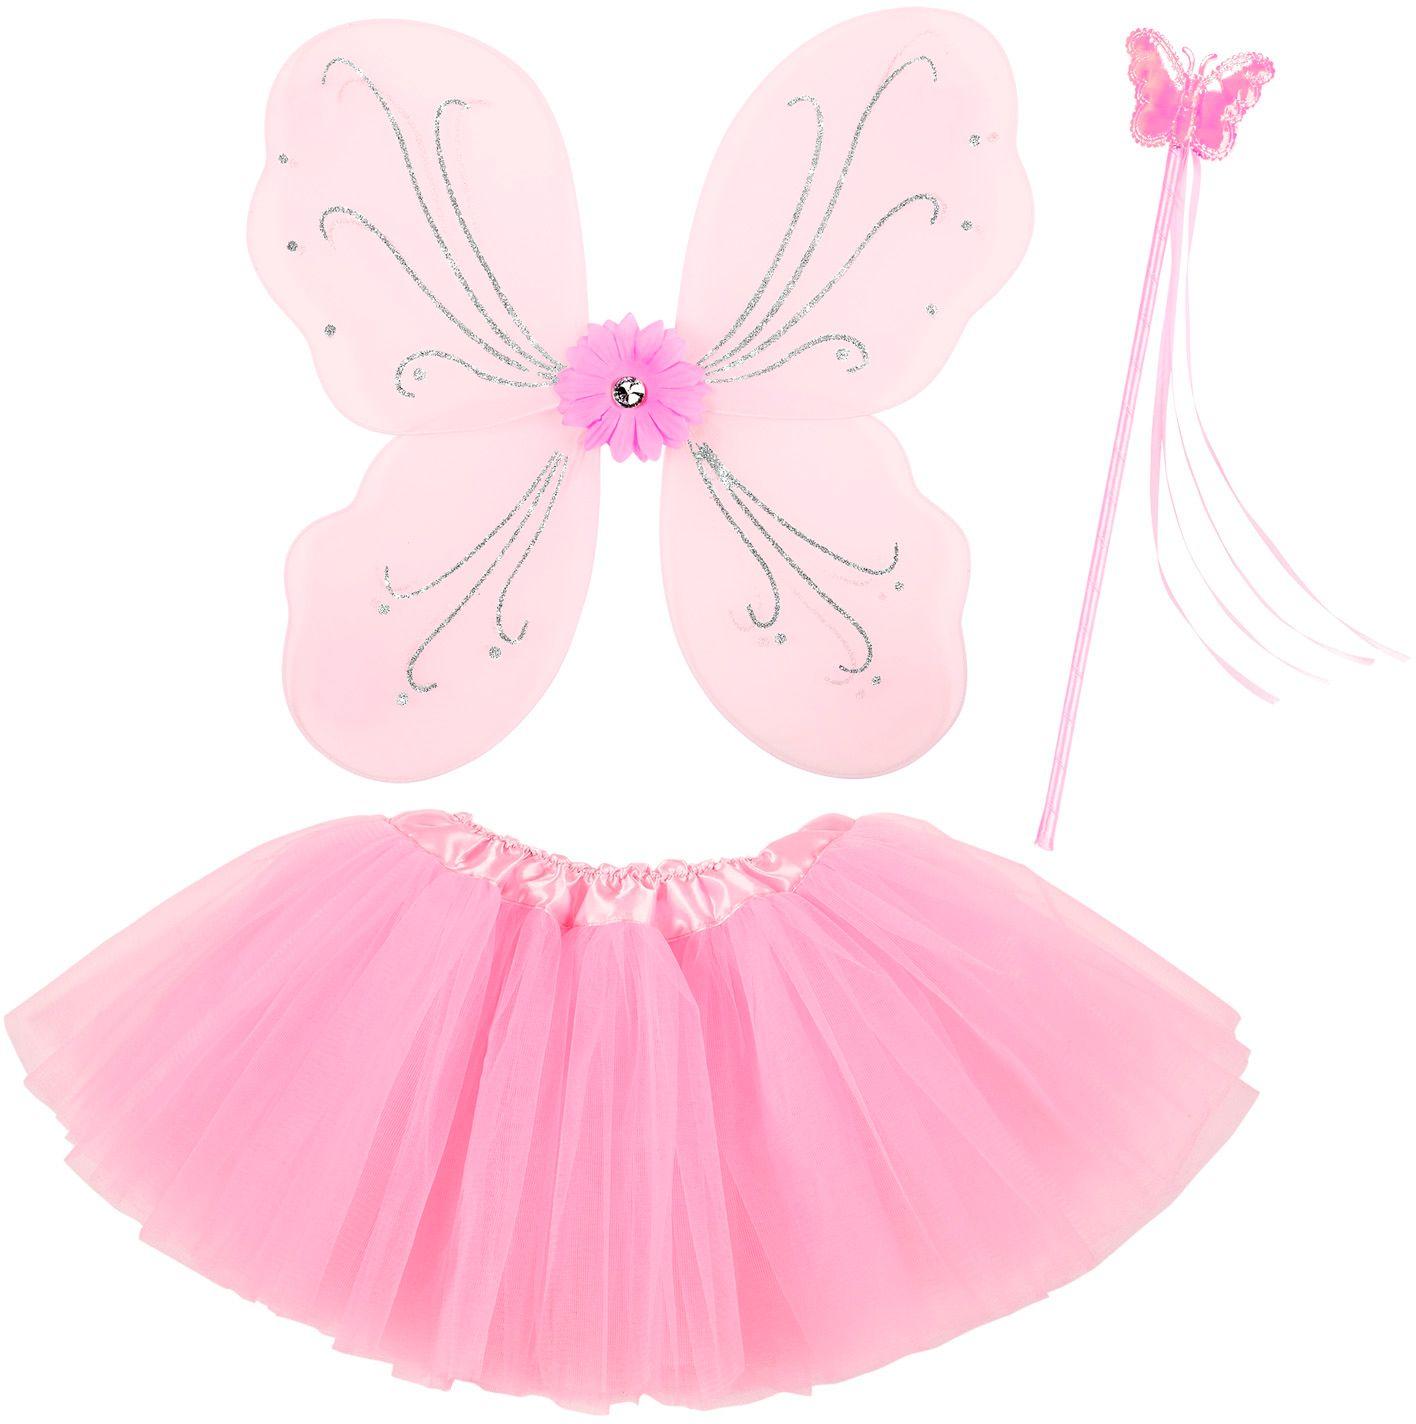 Roze feeën vleugels met tutu en toverstaf